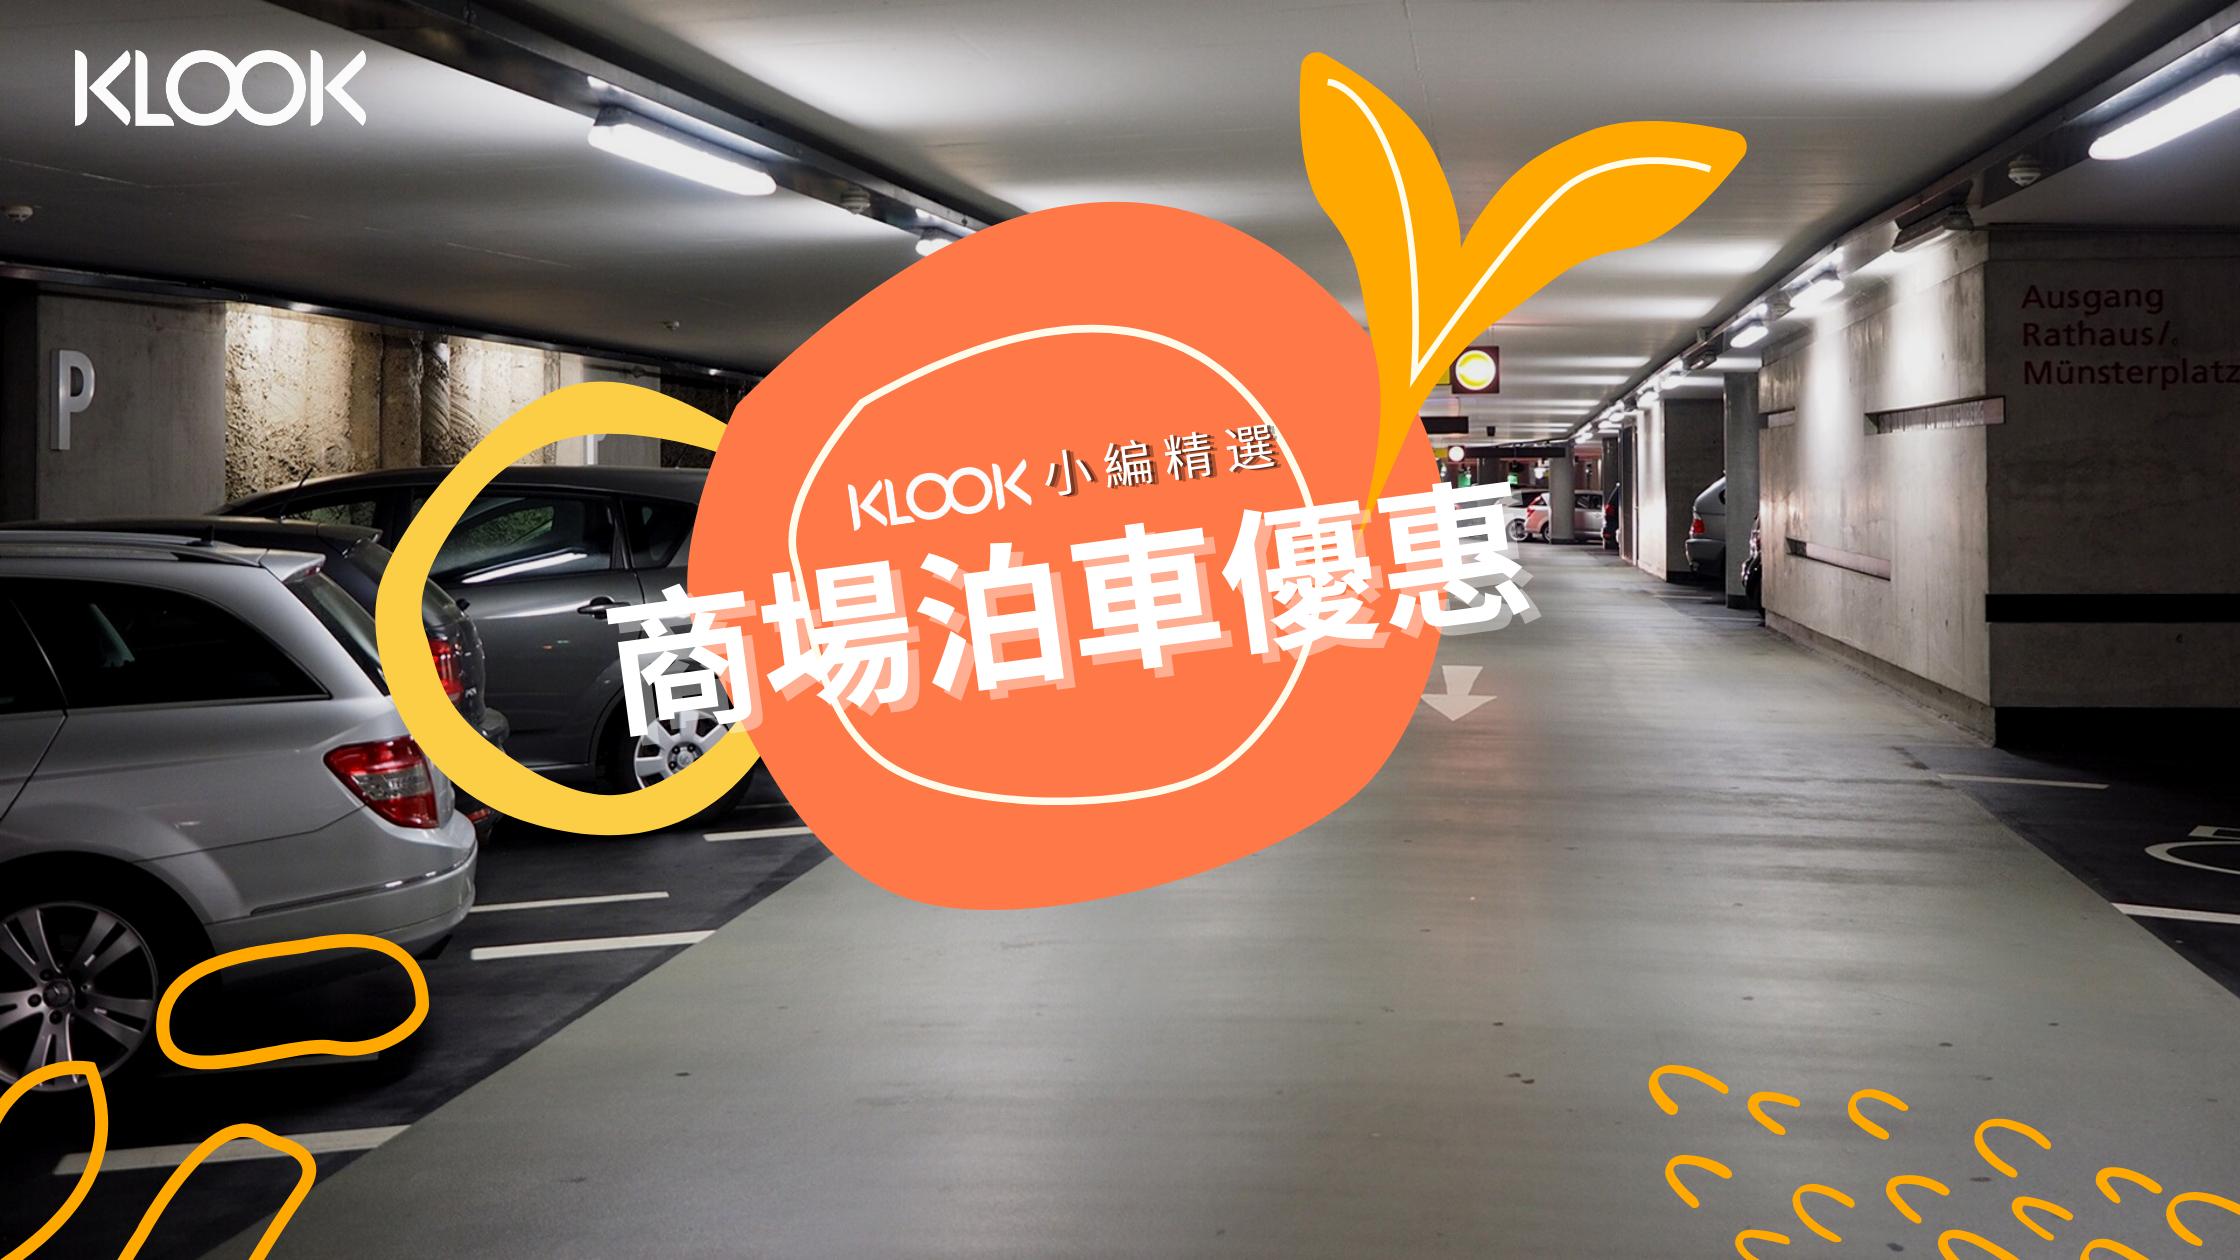 Klook小編精選泊車優惠攻略【更新至2020/07/31】